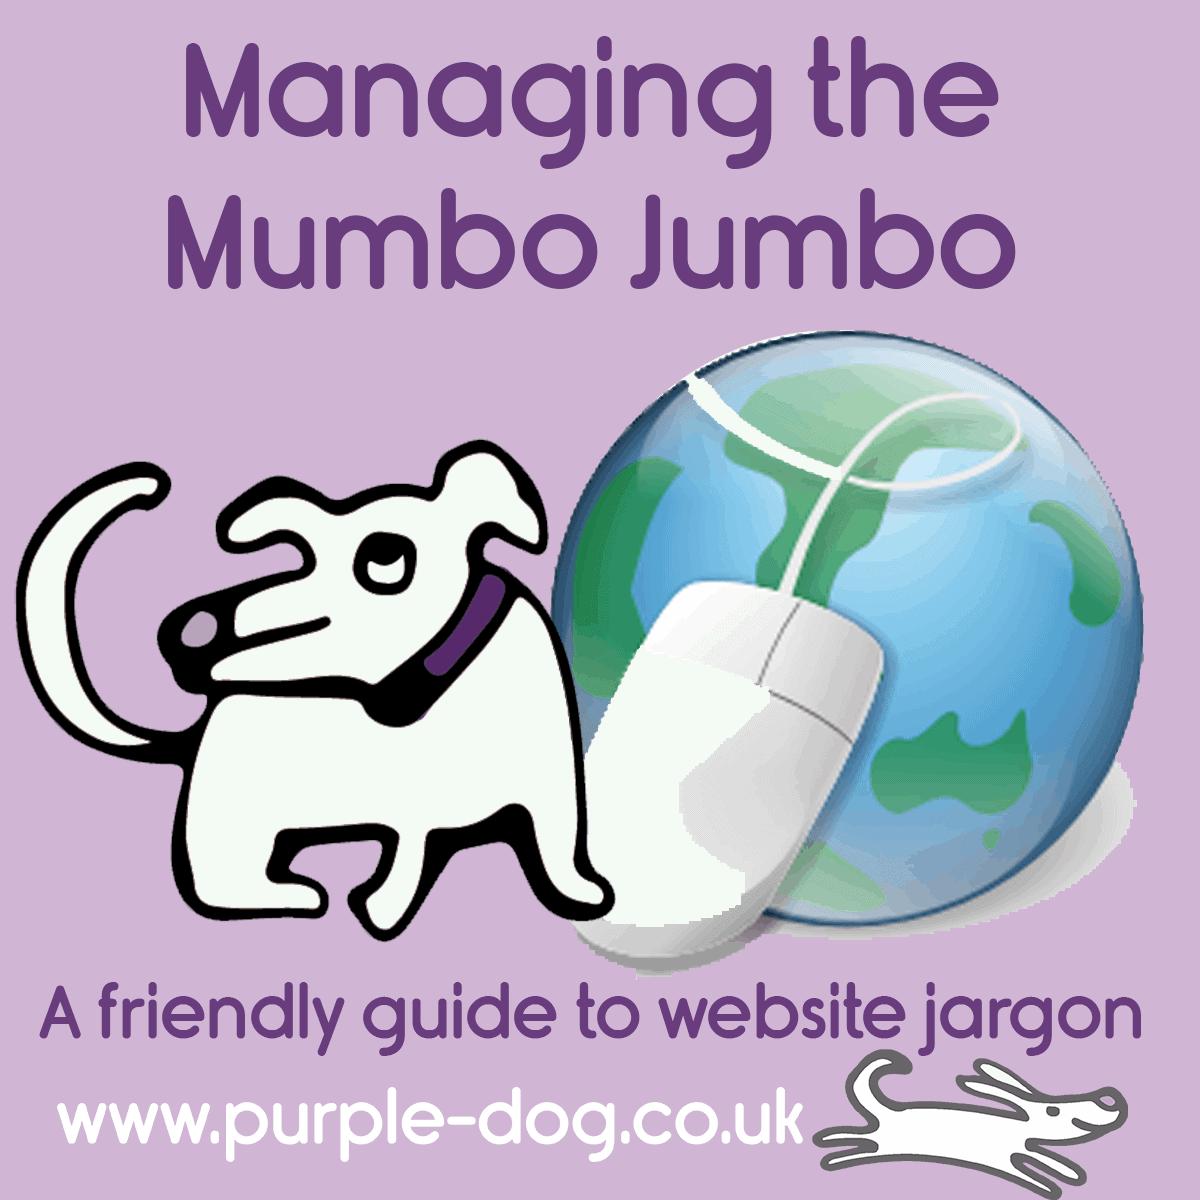 Managing the Mumbo Jumbo - your friendly guide to website jargon